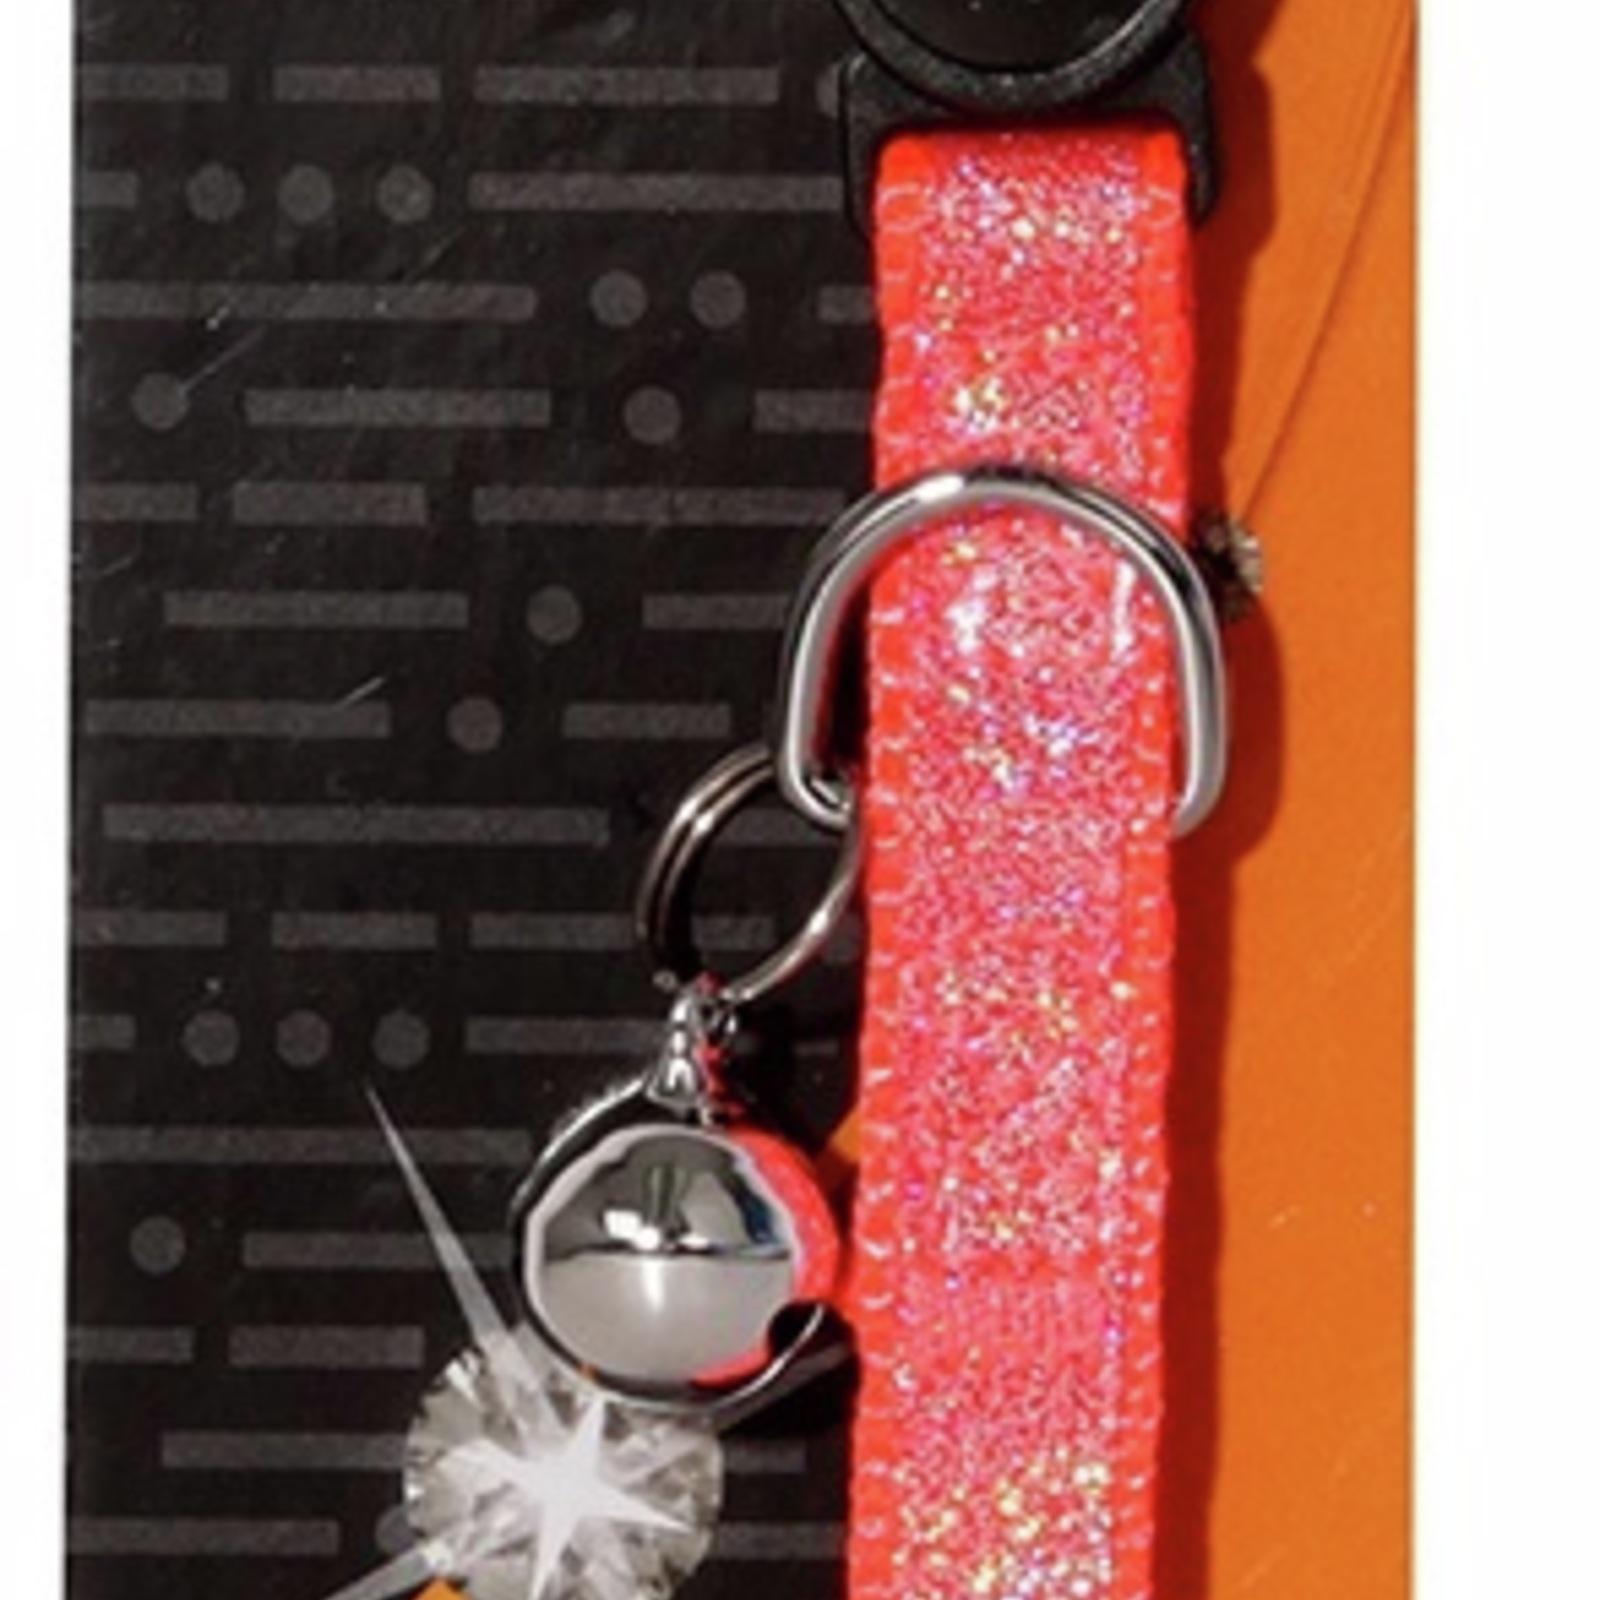 Cat Collar Orange Bling Sparkle with Breakaway Clip - 30cm x 10mm (Pet One)